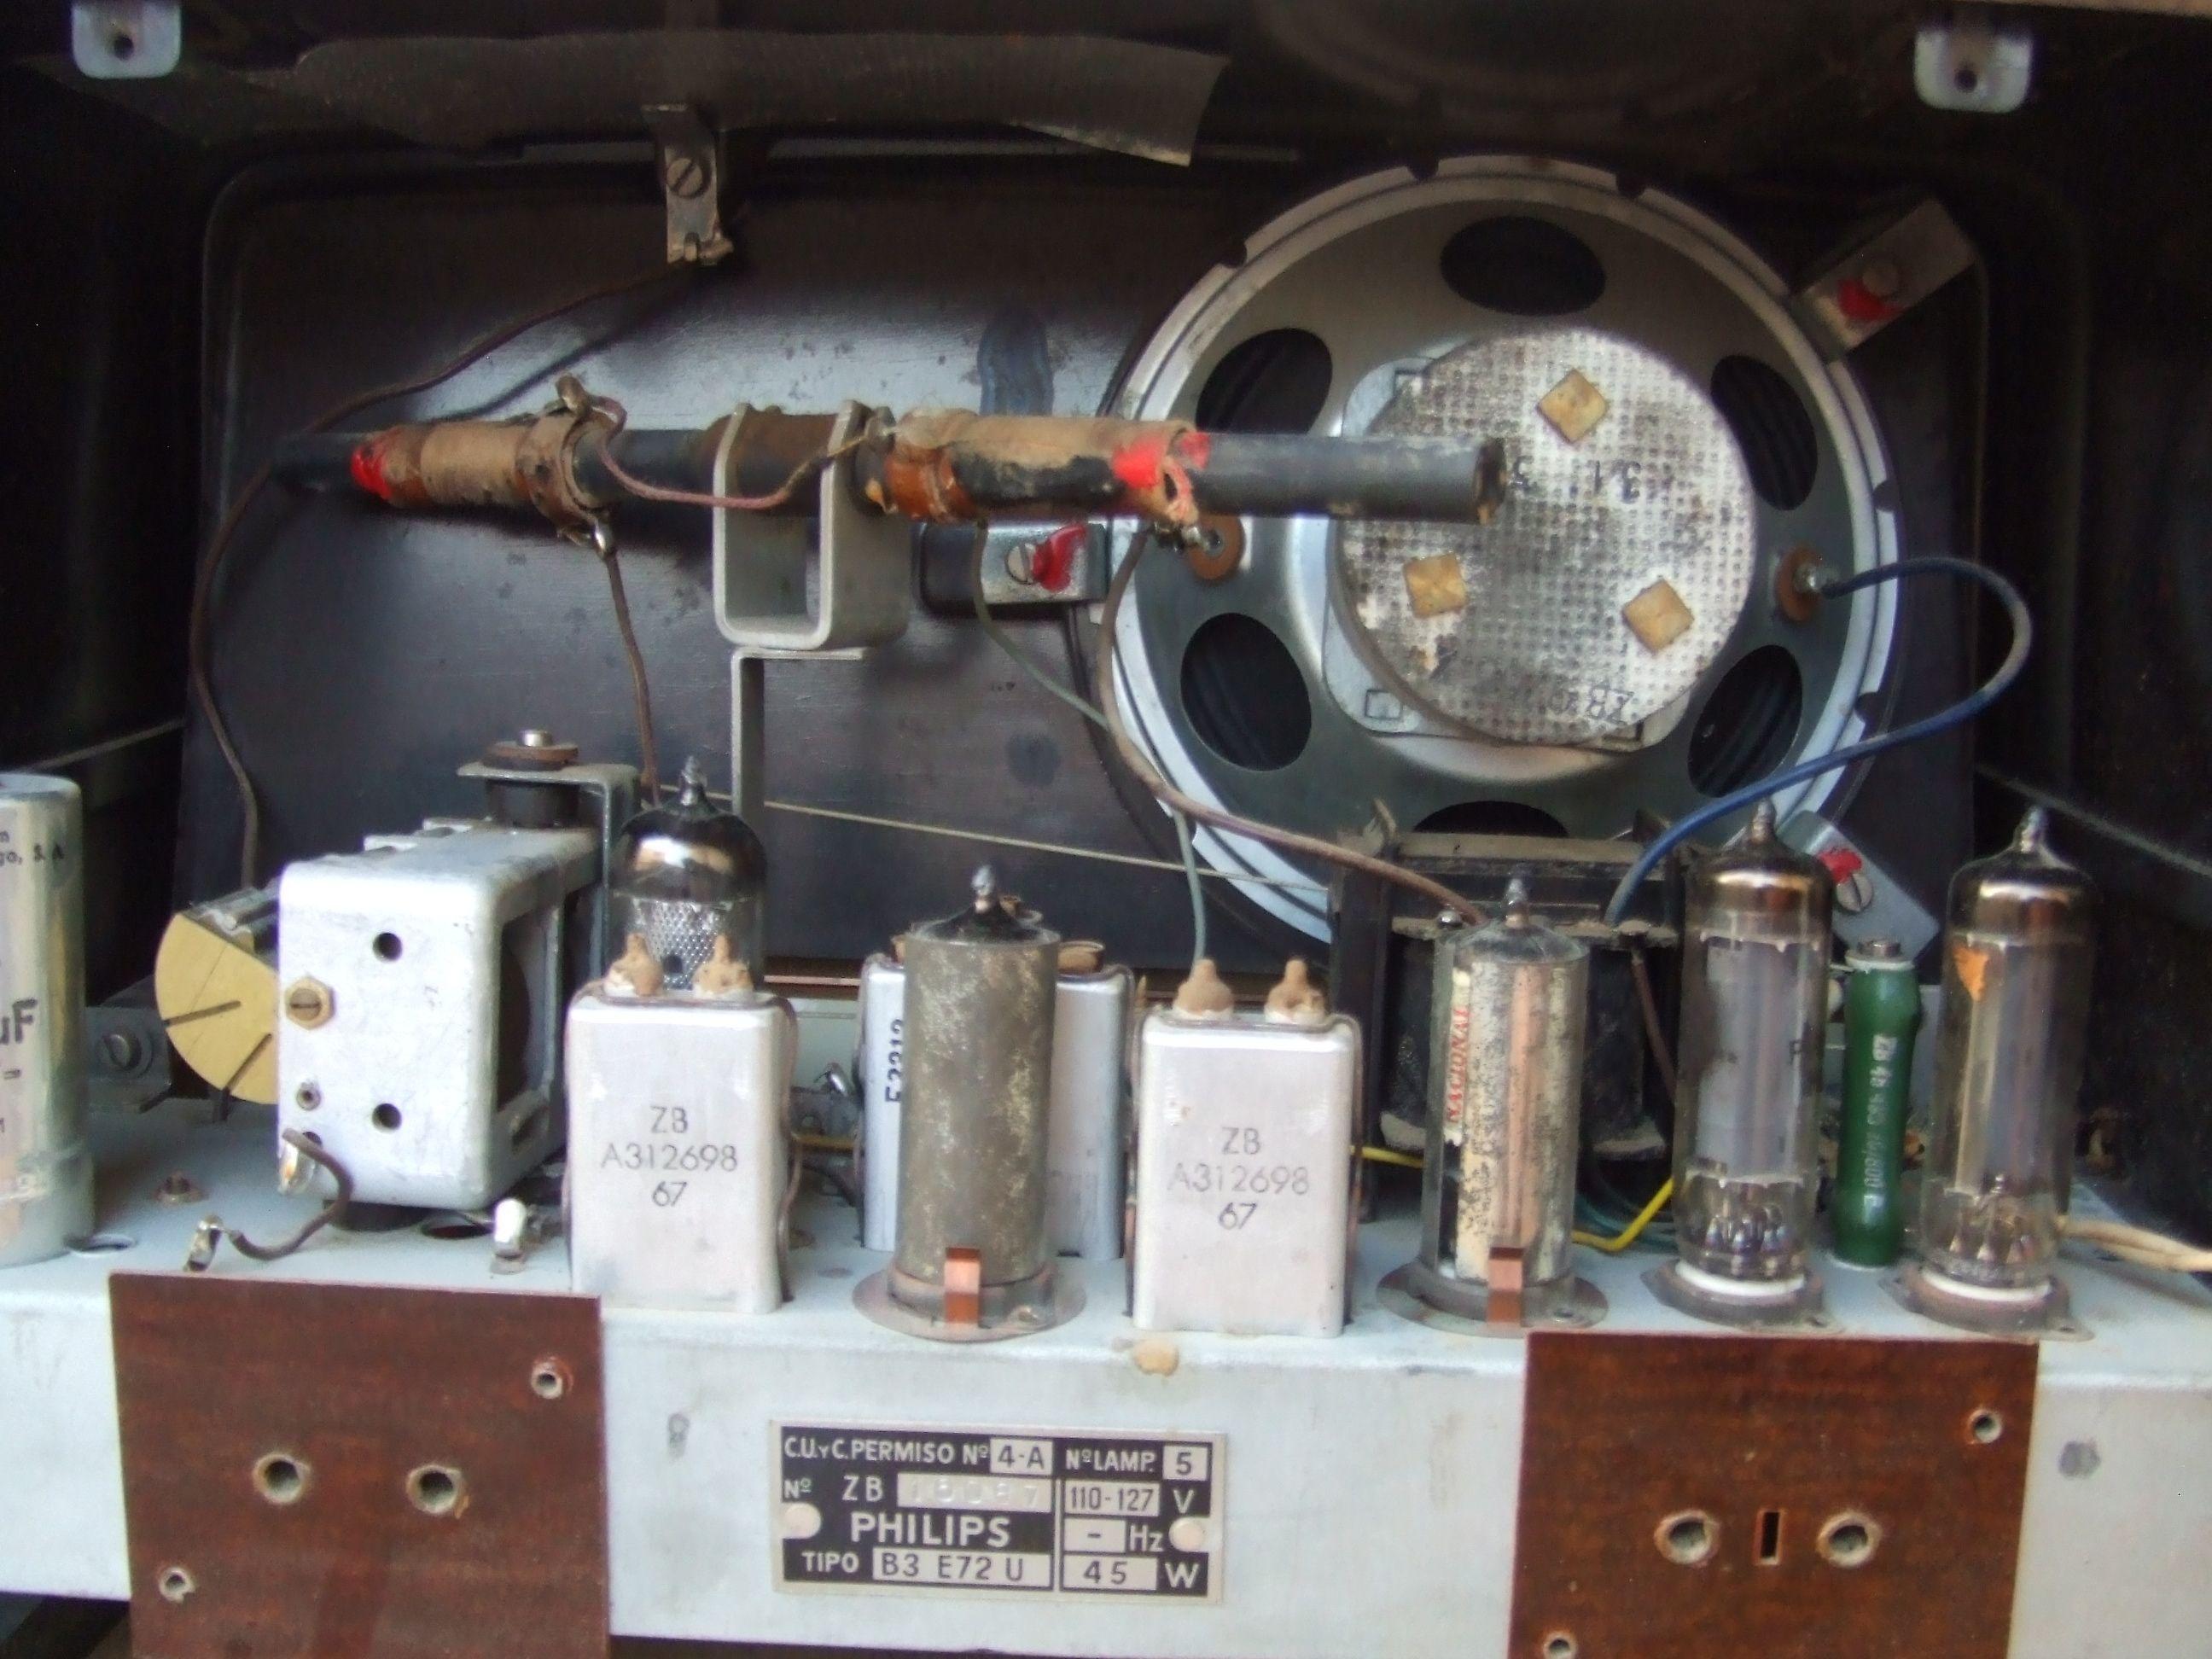 Philips B3e72u Antique Radio Tube Radio